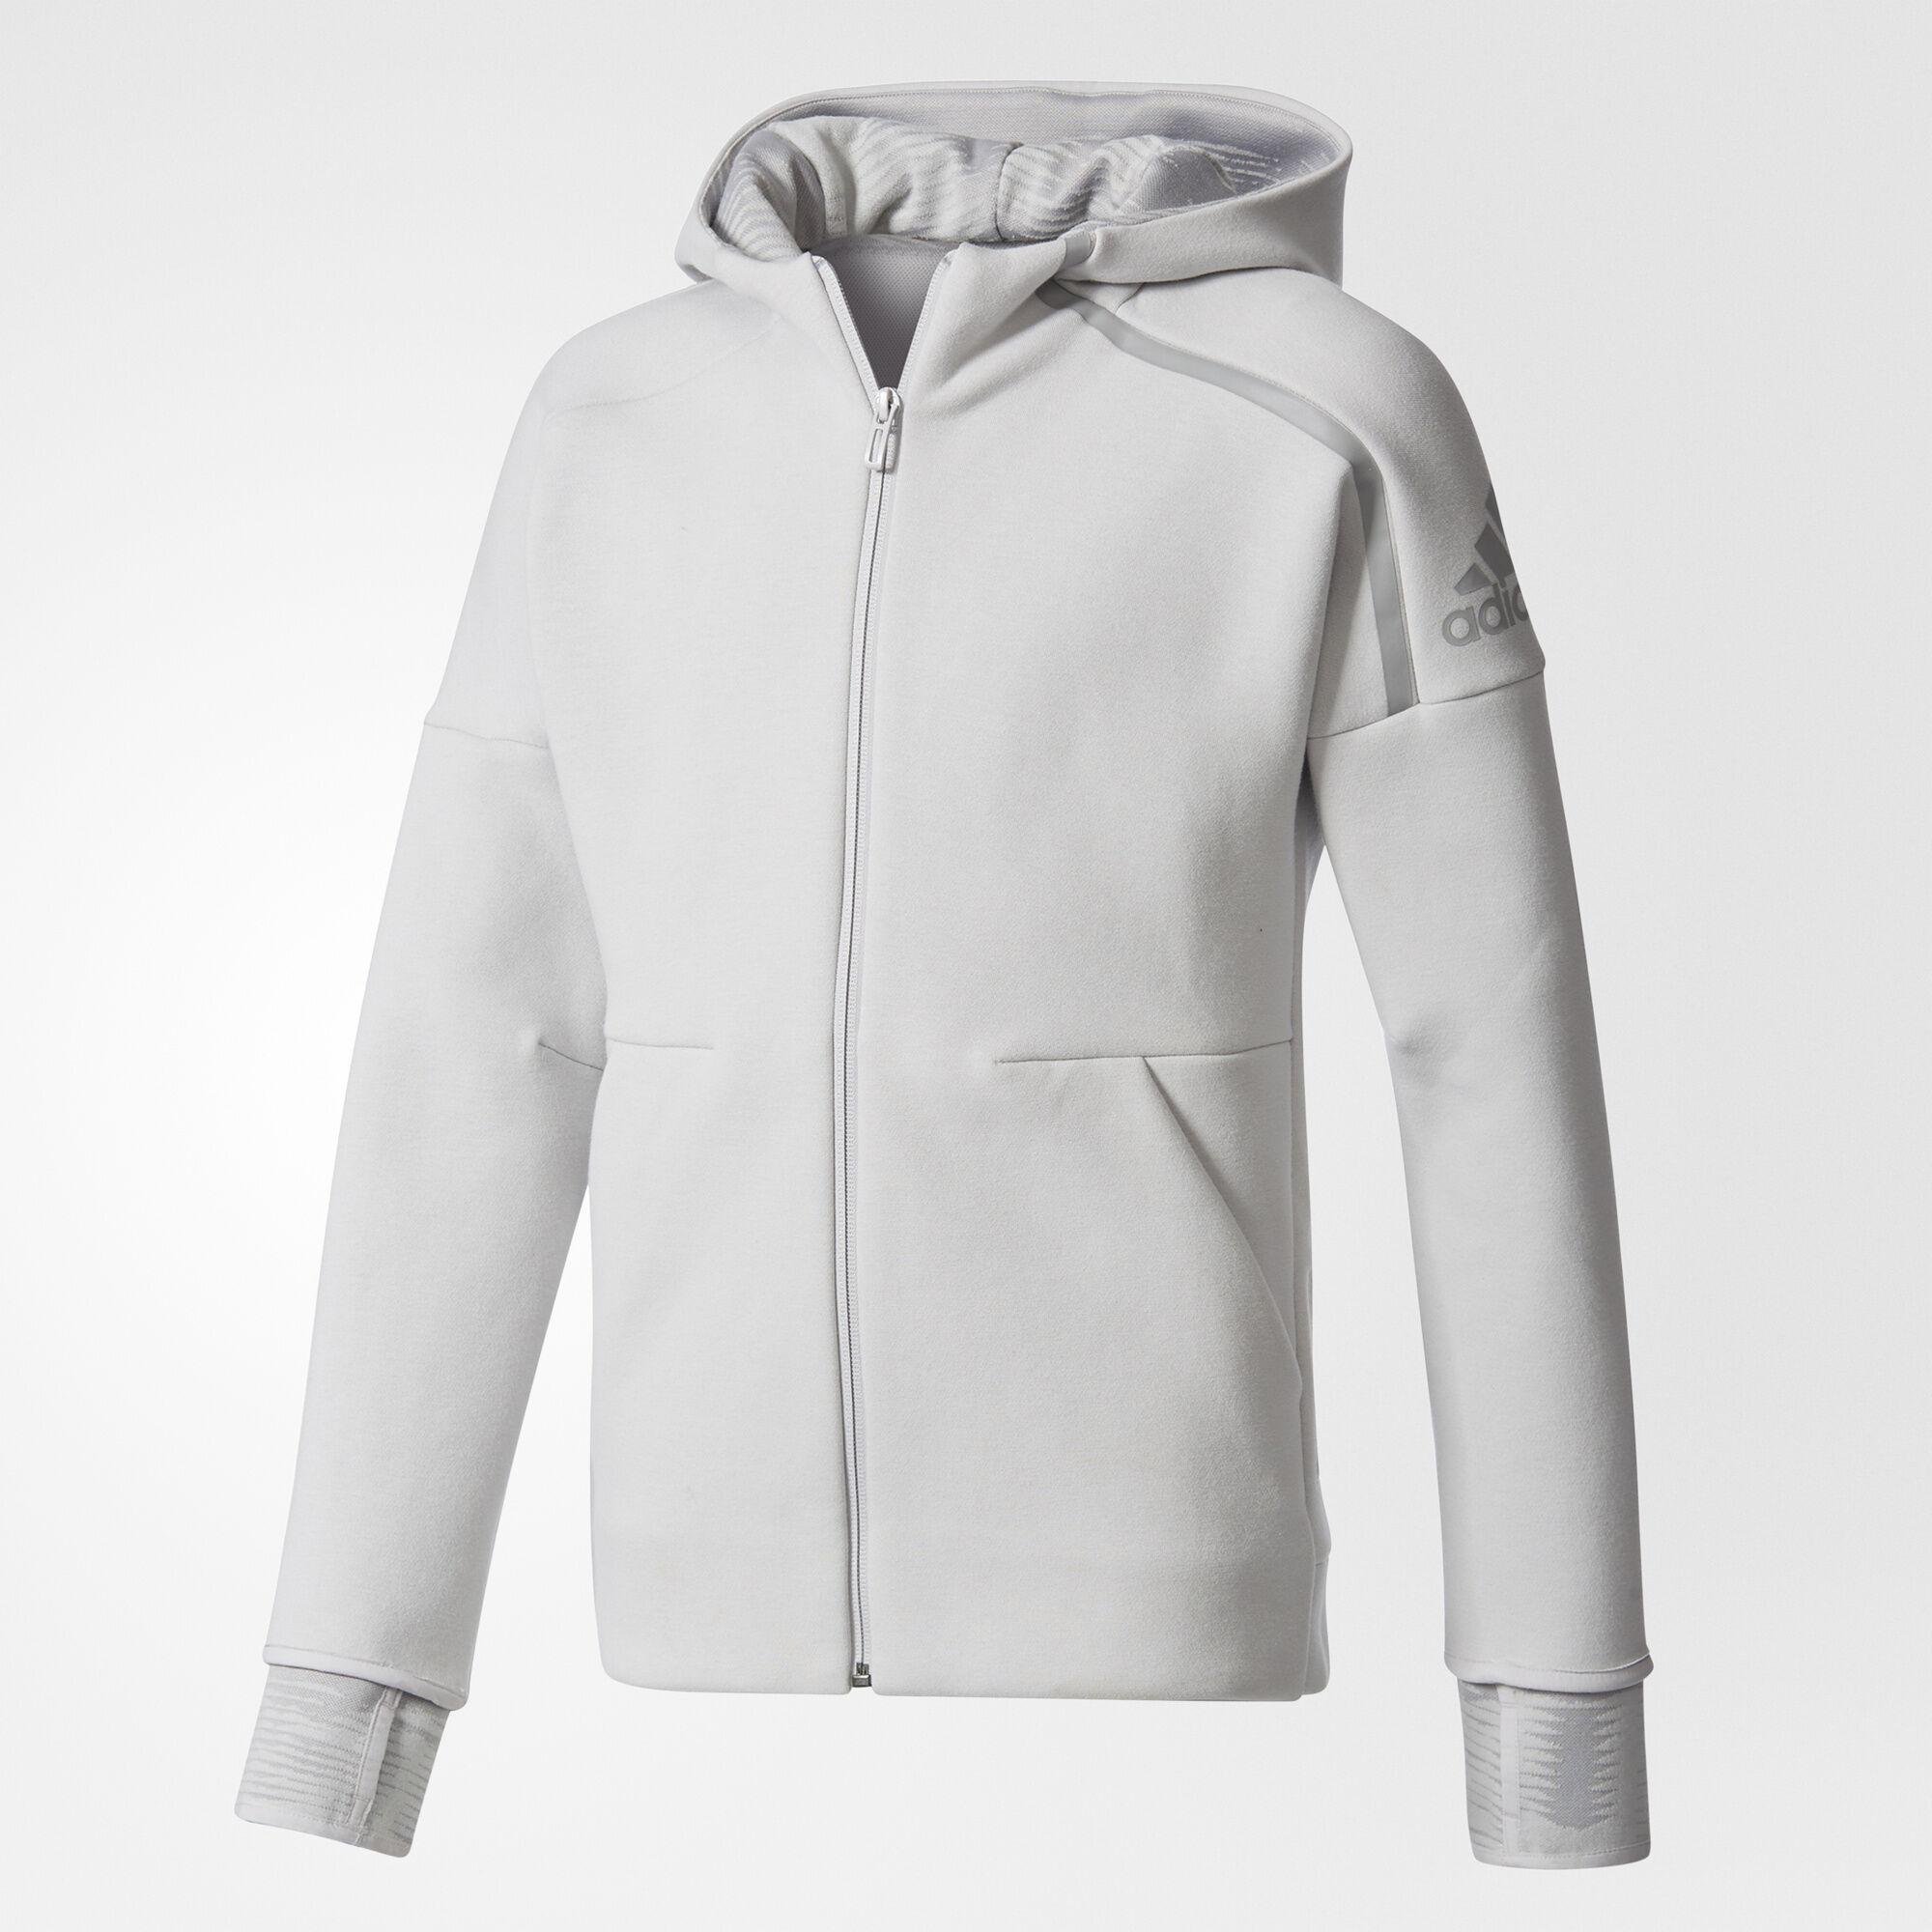 chaqueta adidas zne